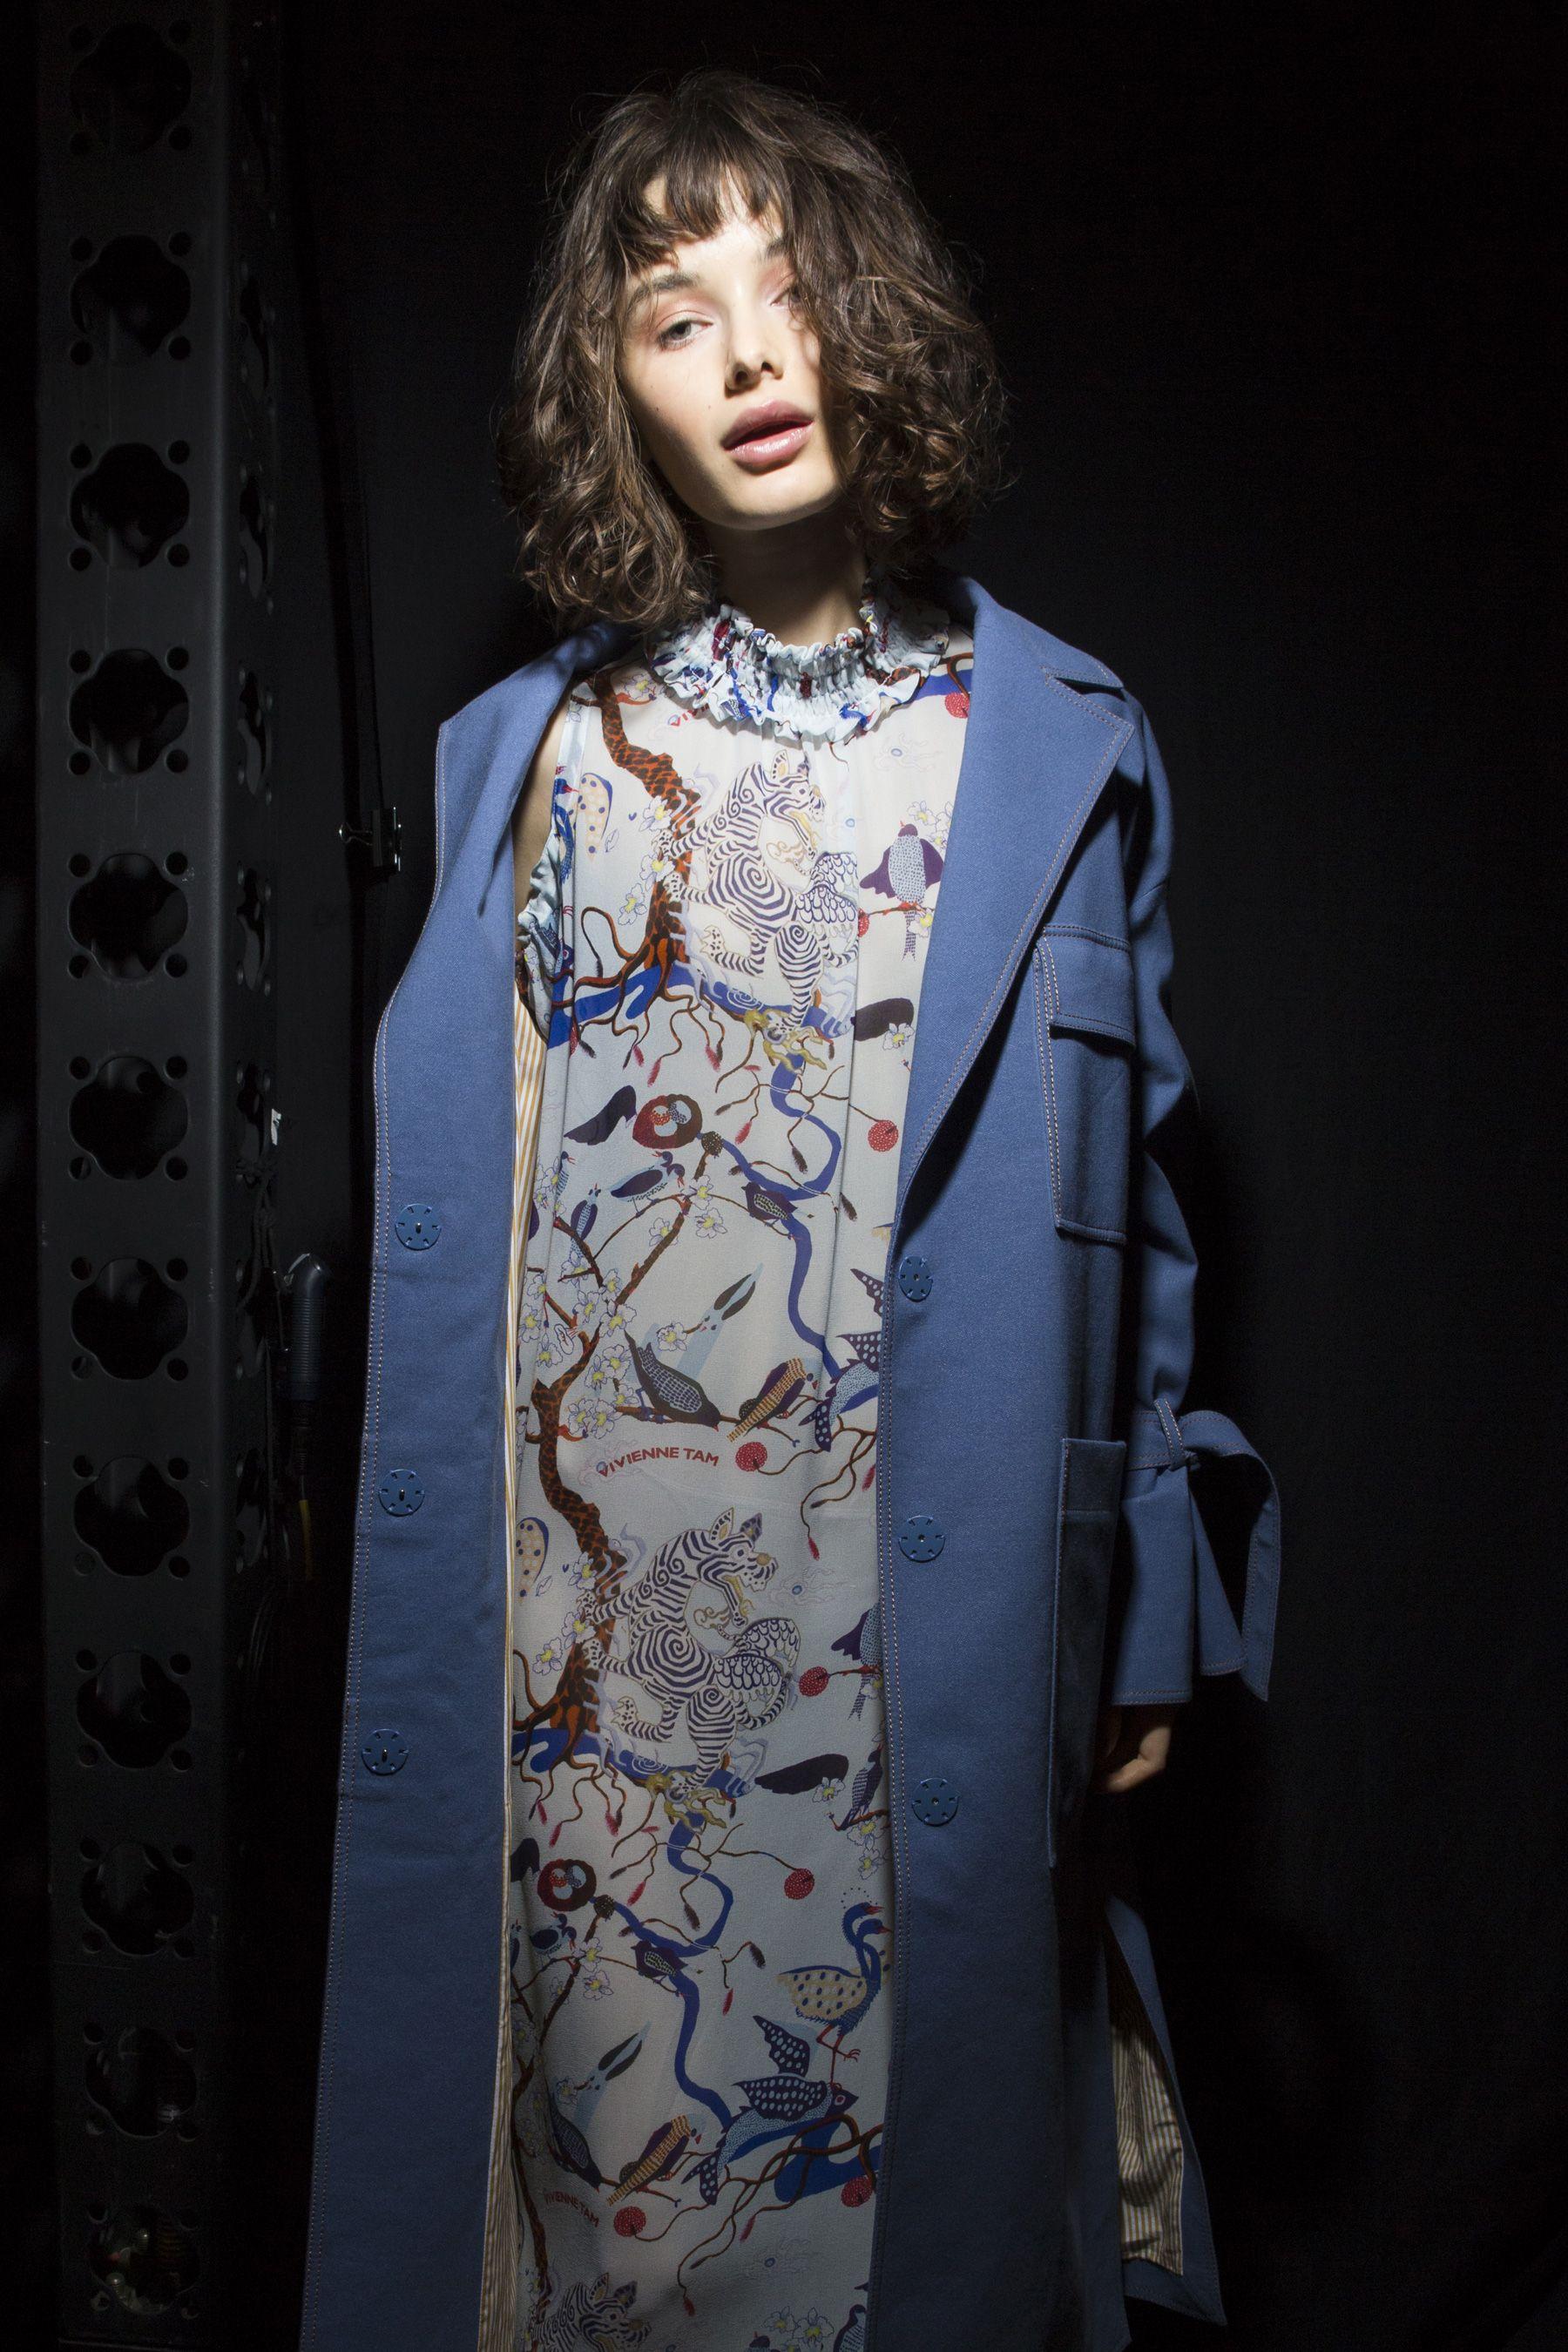 51b9c5fc2 Vivienne Tam Spring 2018 Fashion Show Backstage | Designers ...